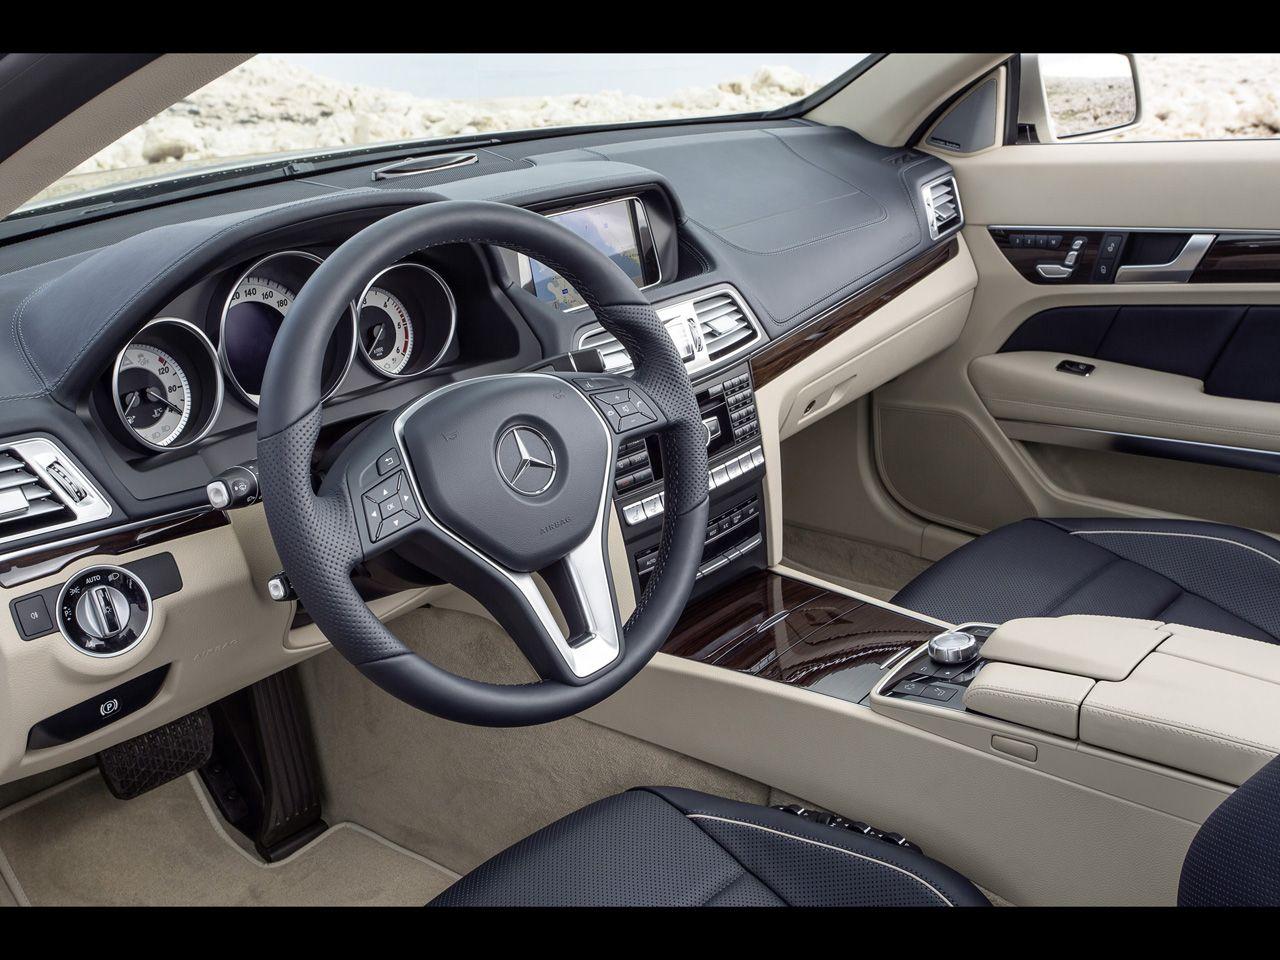 2013 Mercedes Benz E Class Cabriolet Interior Mercedes Benz E350